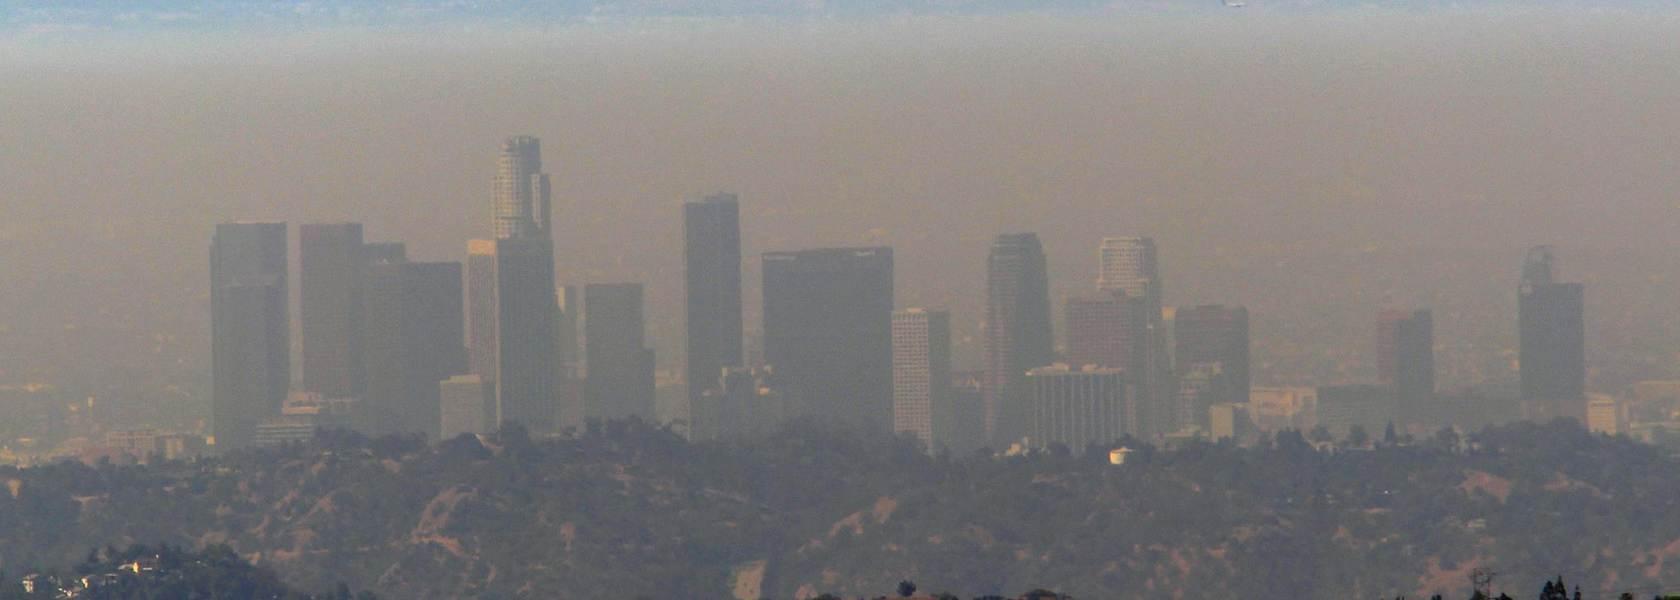 140620-la-air-pollution-jsw-431p_b227d2c47d80568a8688071c2f95bf18.nbcnews-fp-1680-600